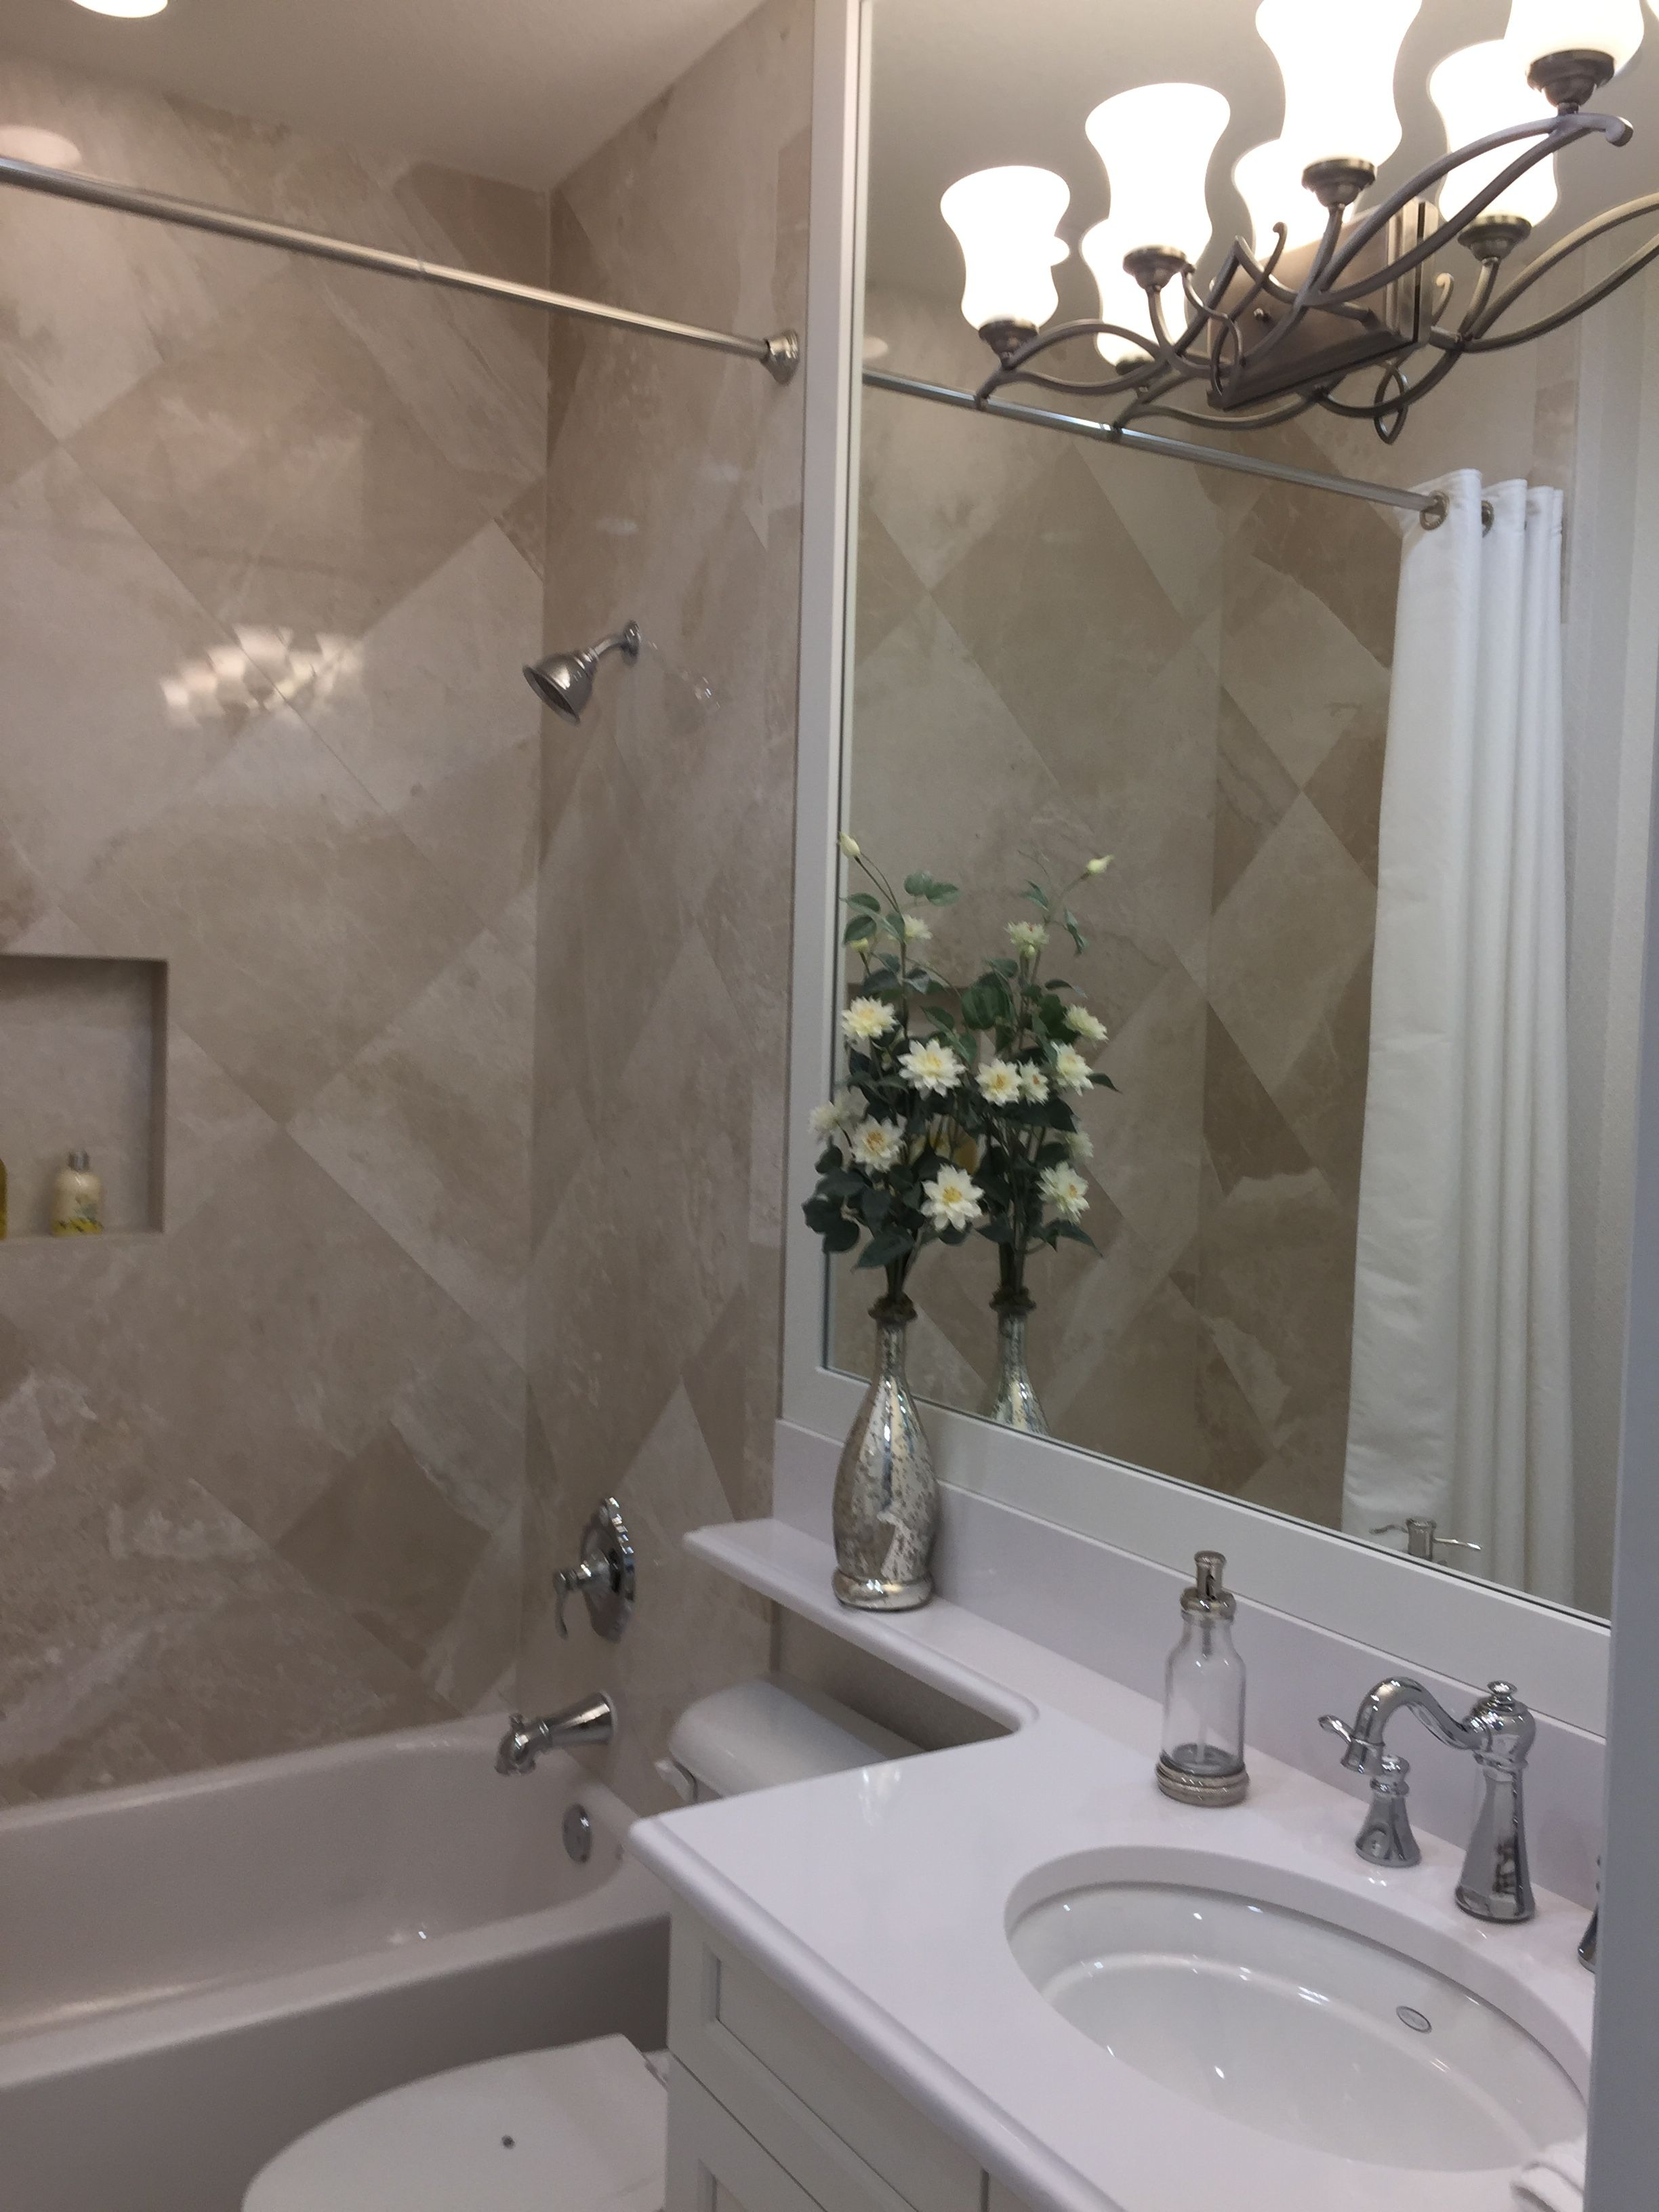 Pin by Diane on Southwest Florida Bathroom mirror